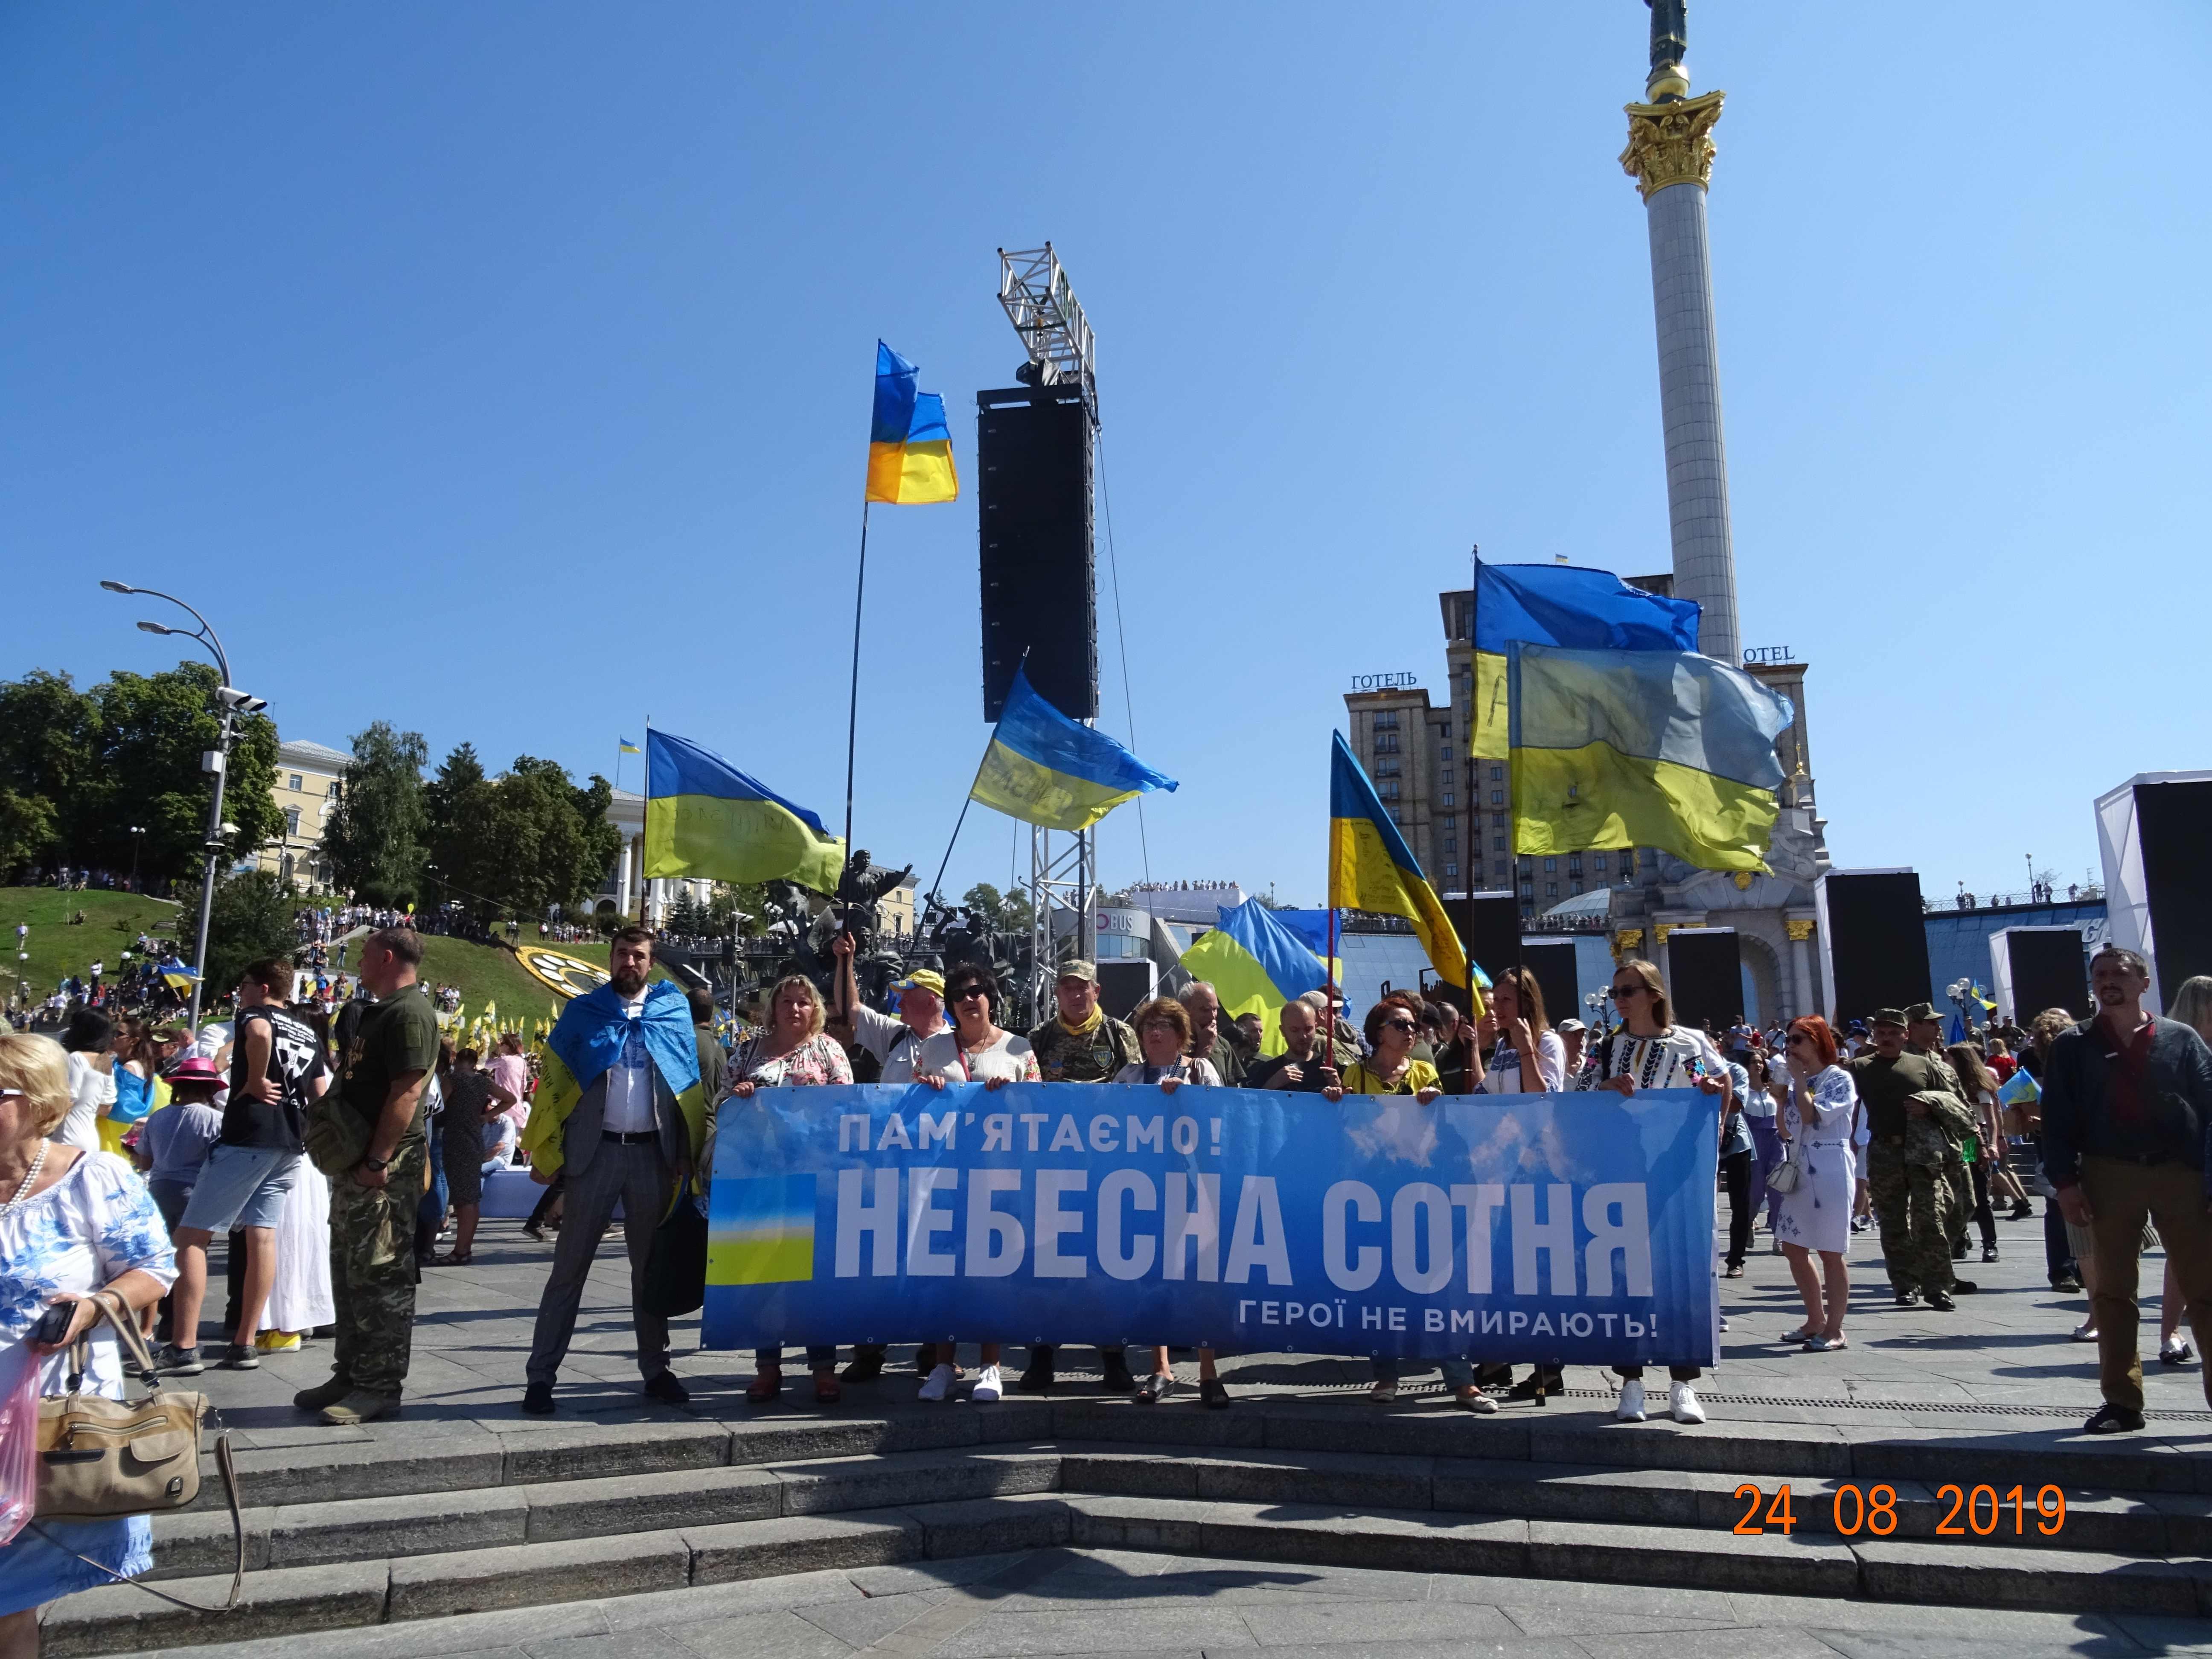 Defenders-of-Ukraine-Parad-24.Aug.19 - DSC06361.jpg